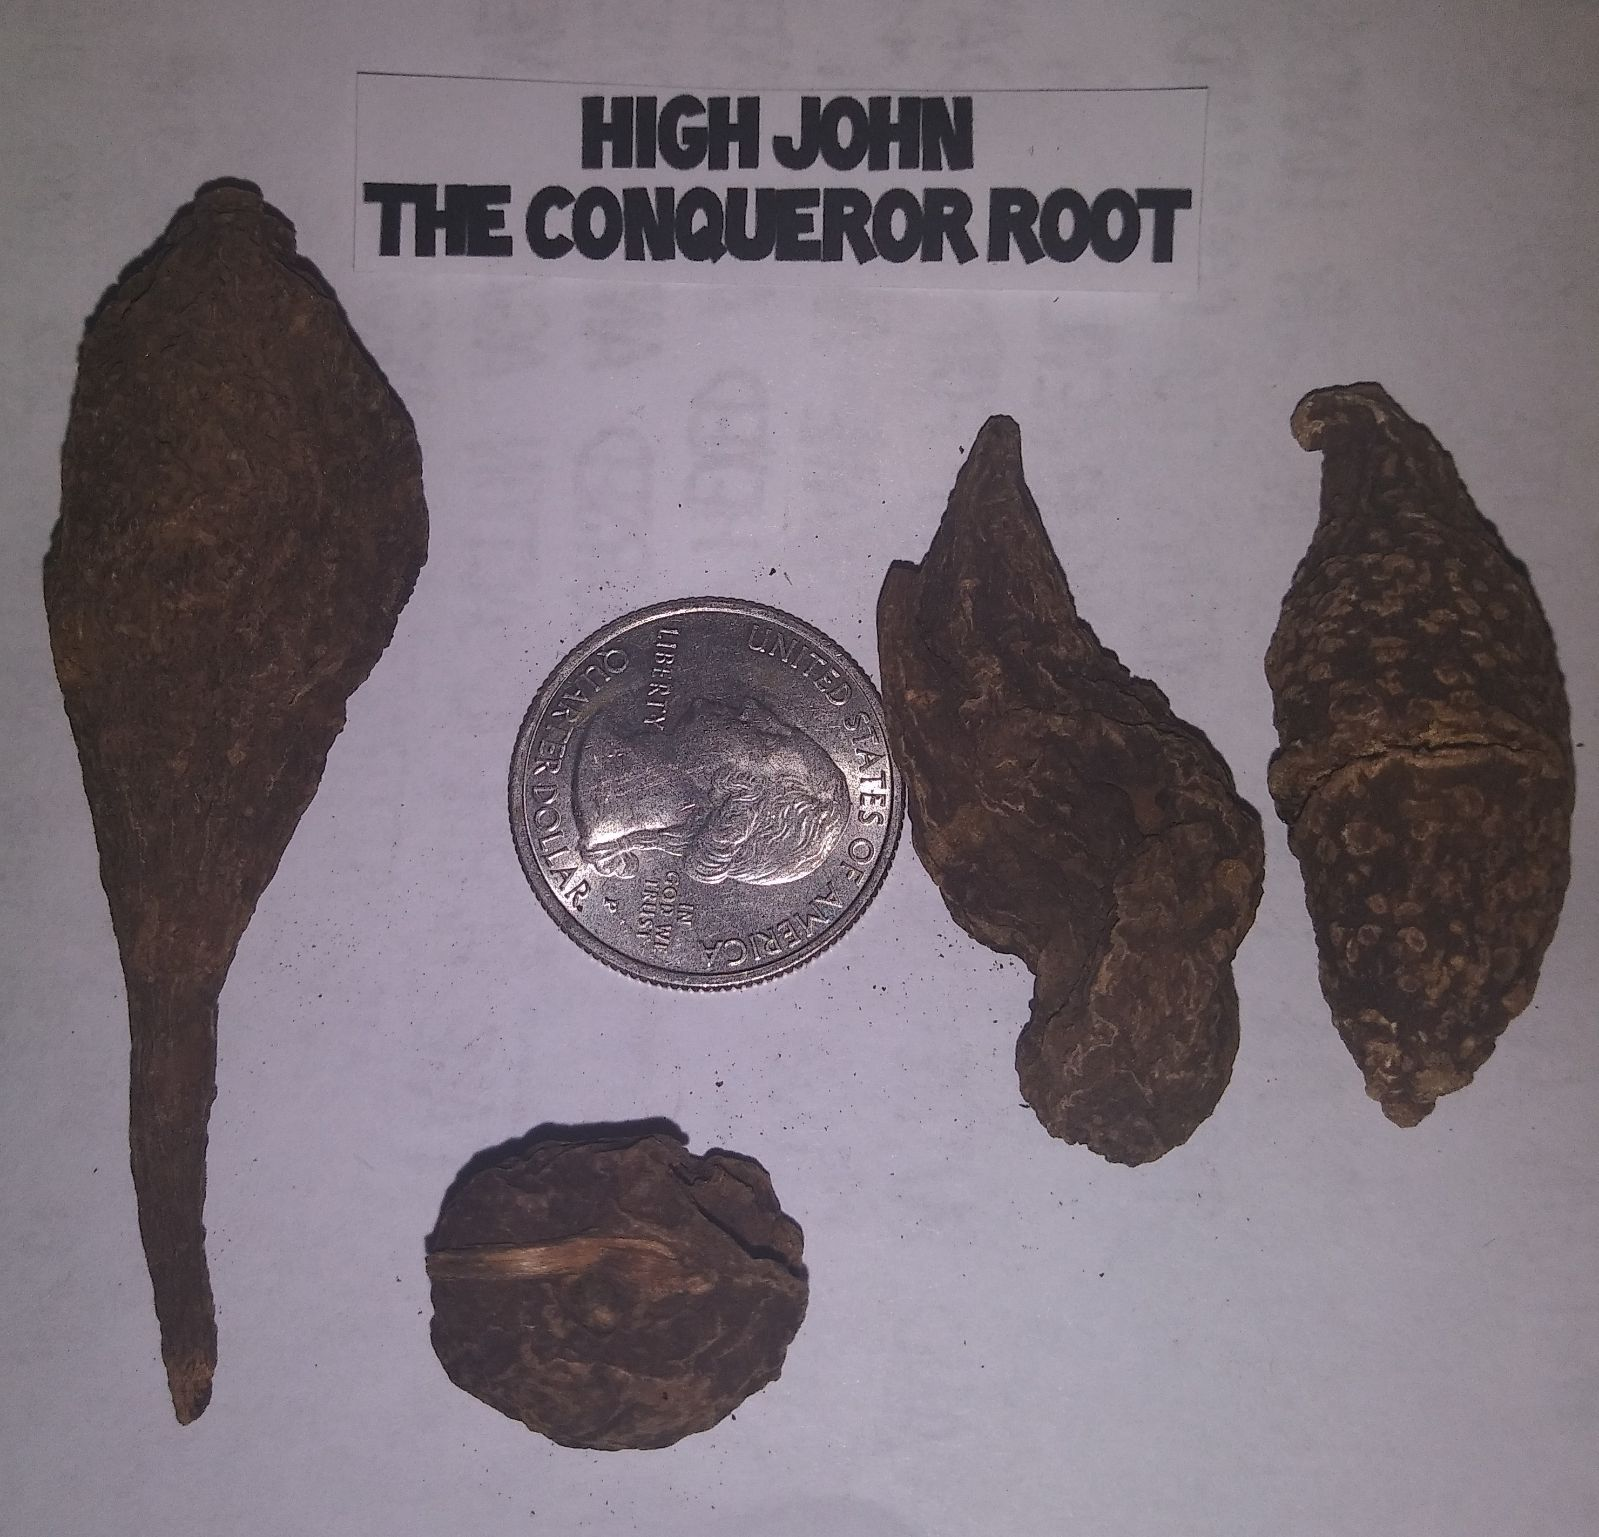 HIGH JOHN THE CONQUEROR ROOTS